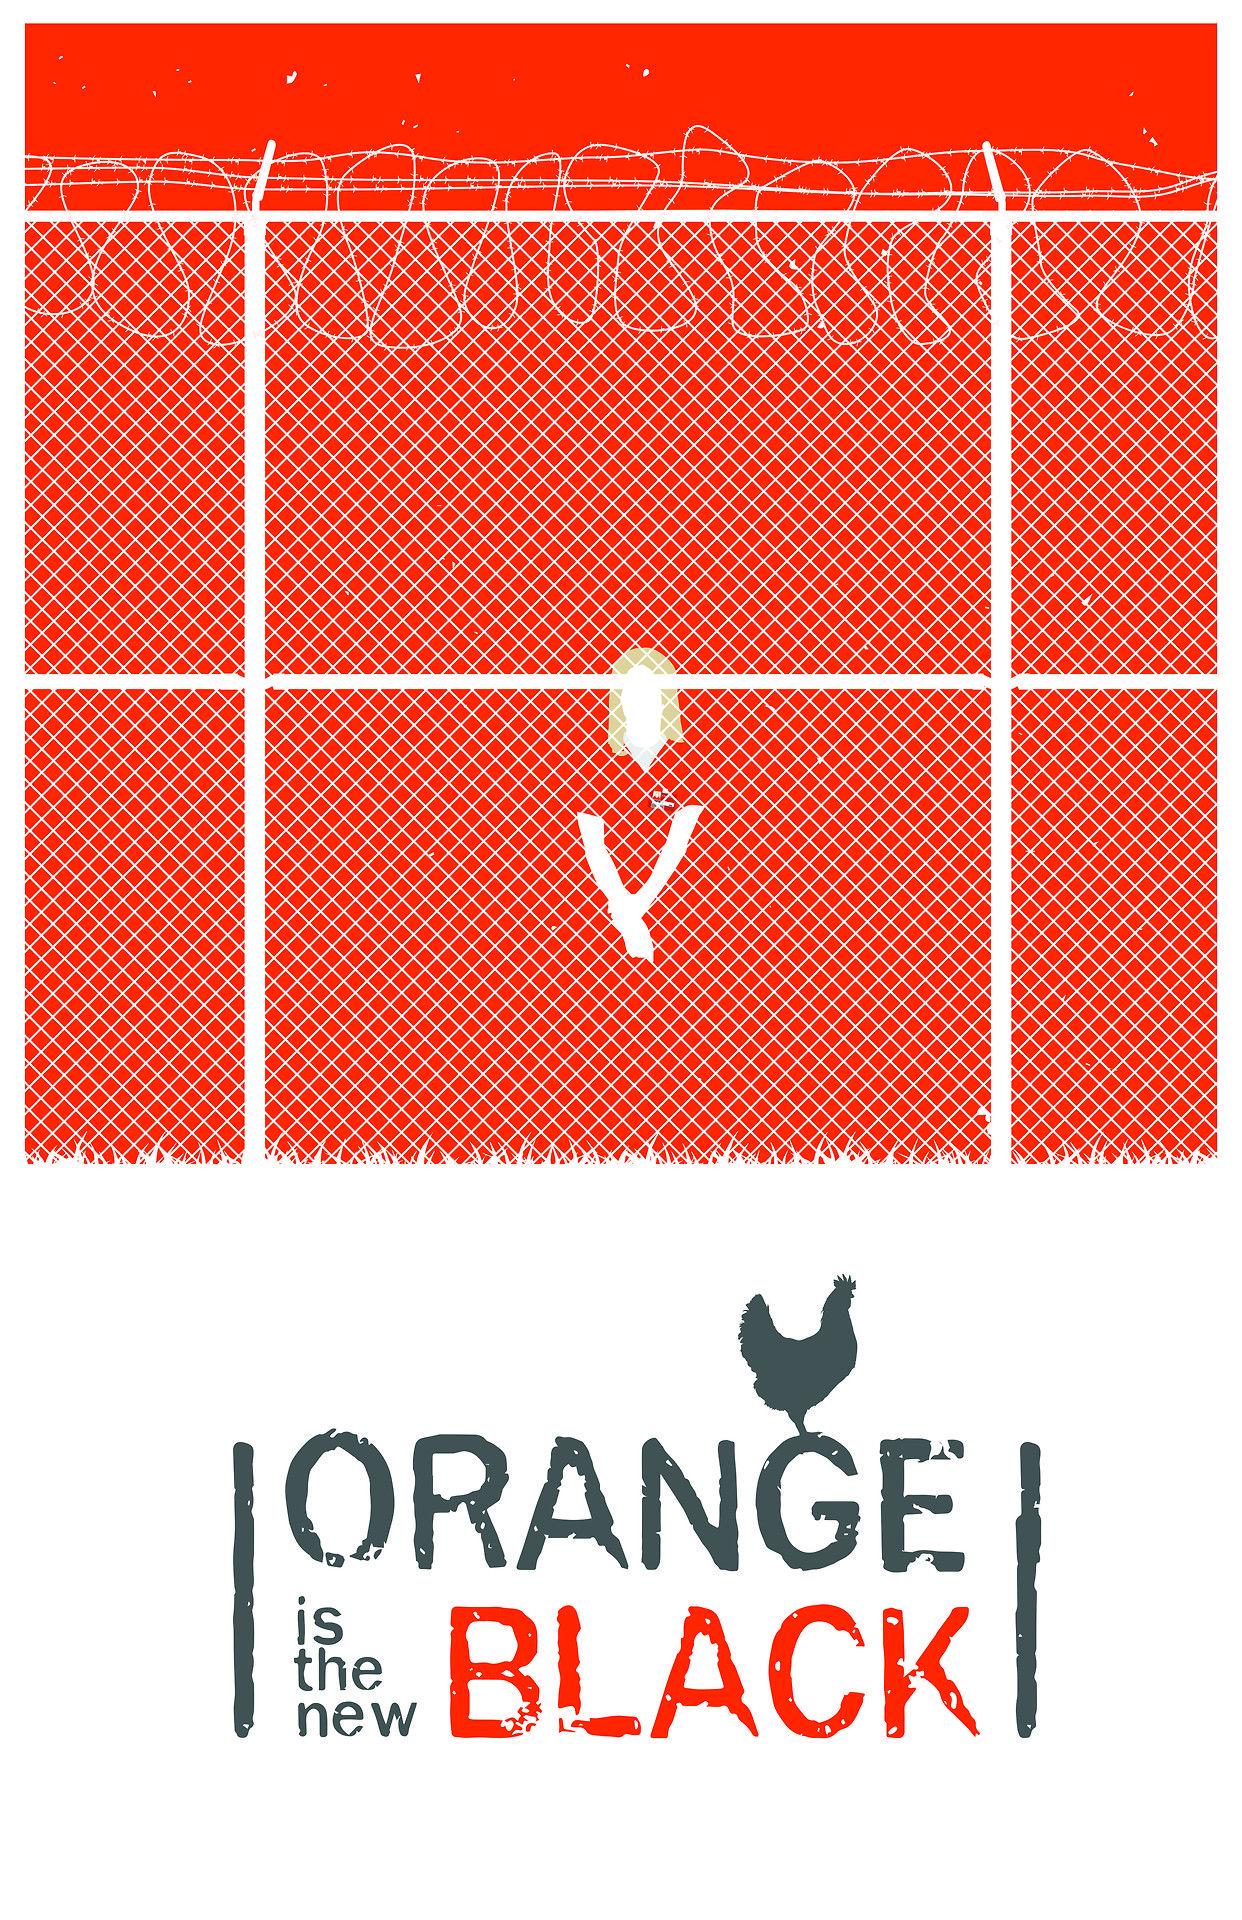 Orange iphone wallpaper tumblr - Orange Is The New Black Netflix Original Series Official Tumblr Oitnb So